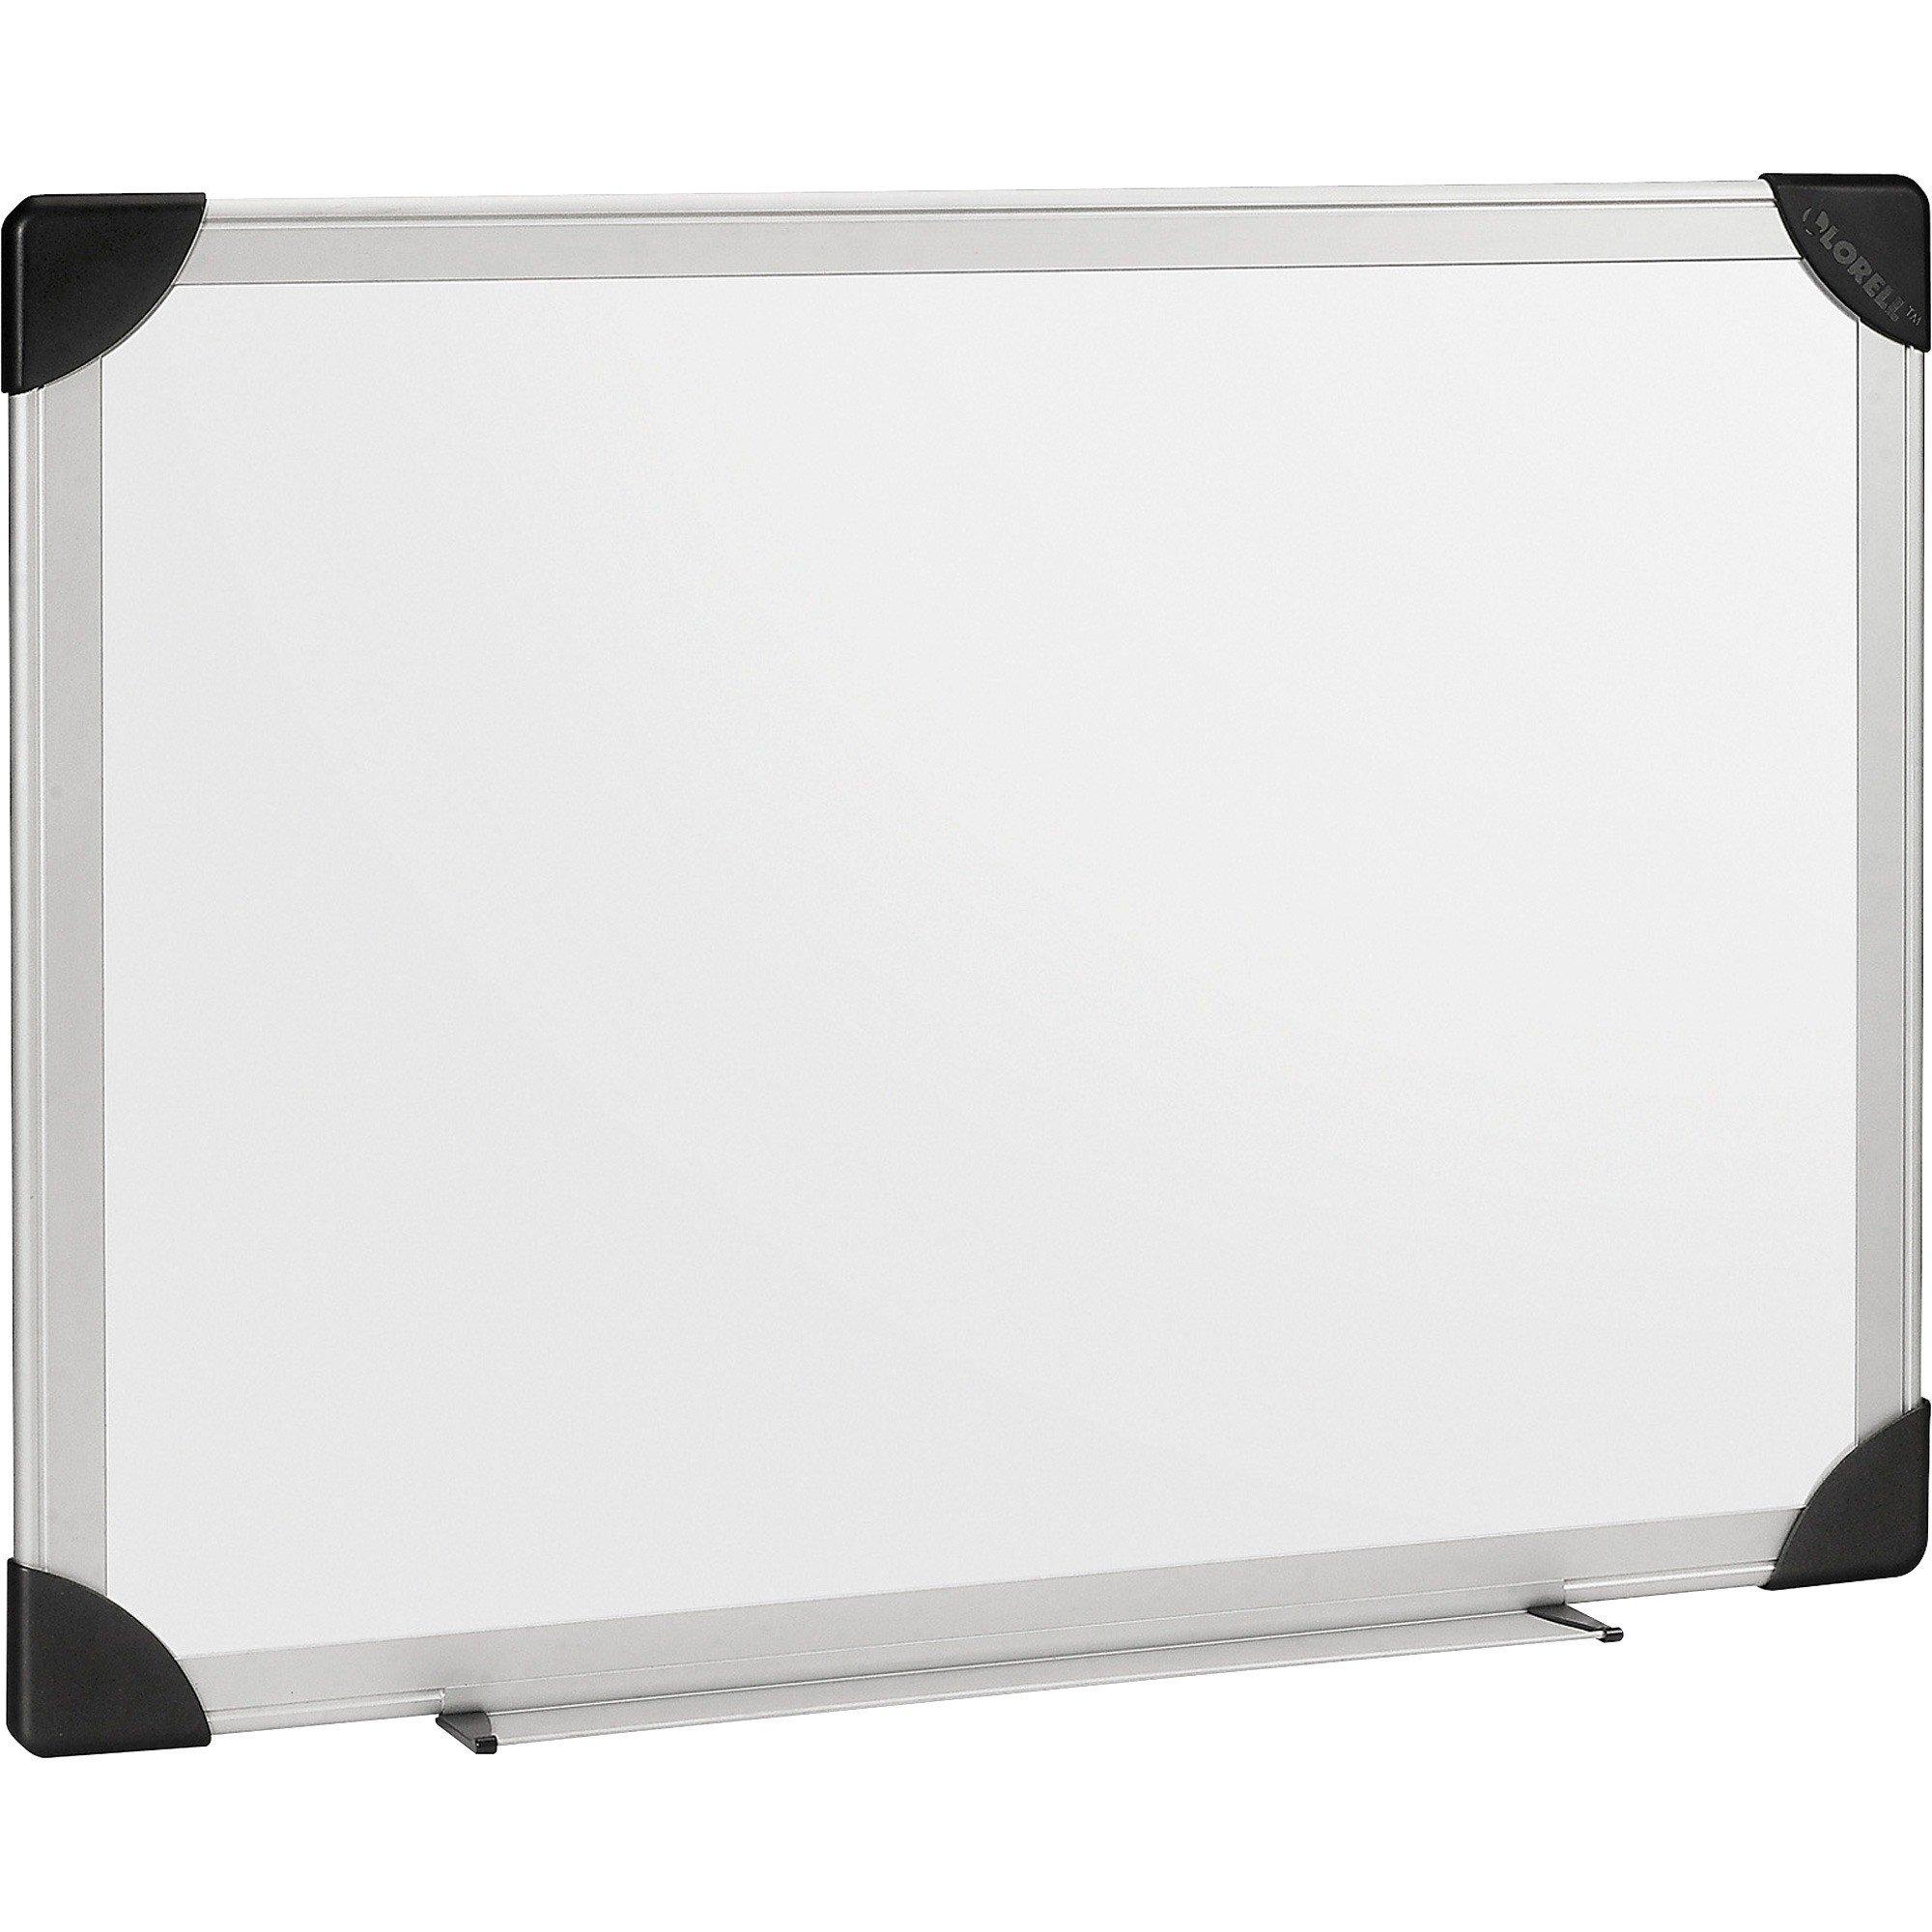 Lorell Aluminum Frame Dry-erase White Board